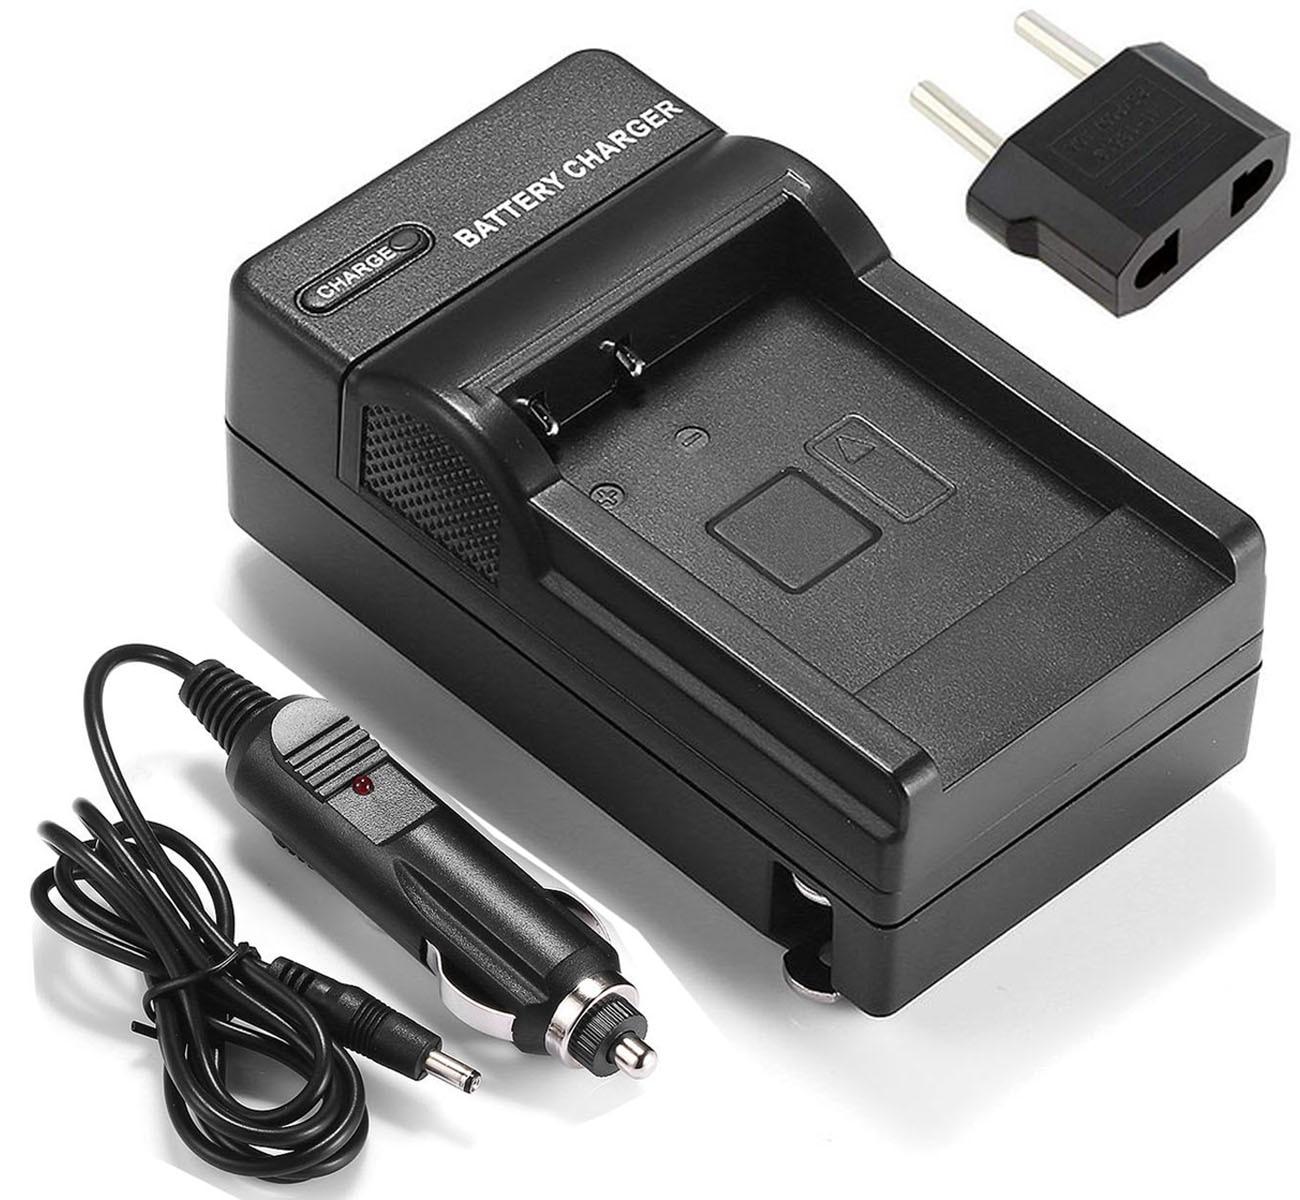 Carregador de Bateria para Panasonic Hc-vx985mgn Hc-vxf990 Hc-vxf990eb-k Filmadora Hc-vx980 Hc-vx980eb-k Hc-vx981 Hc-vx981k Hc-vx985